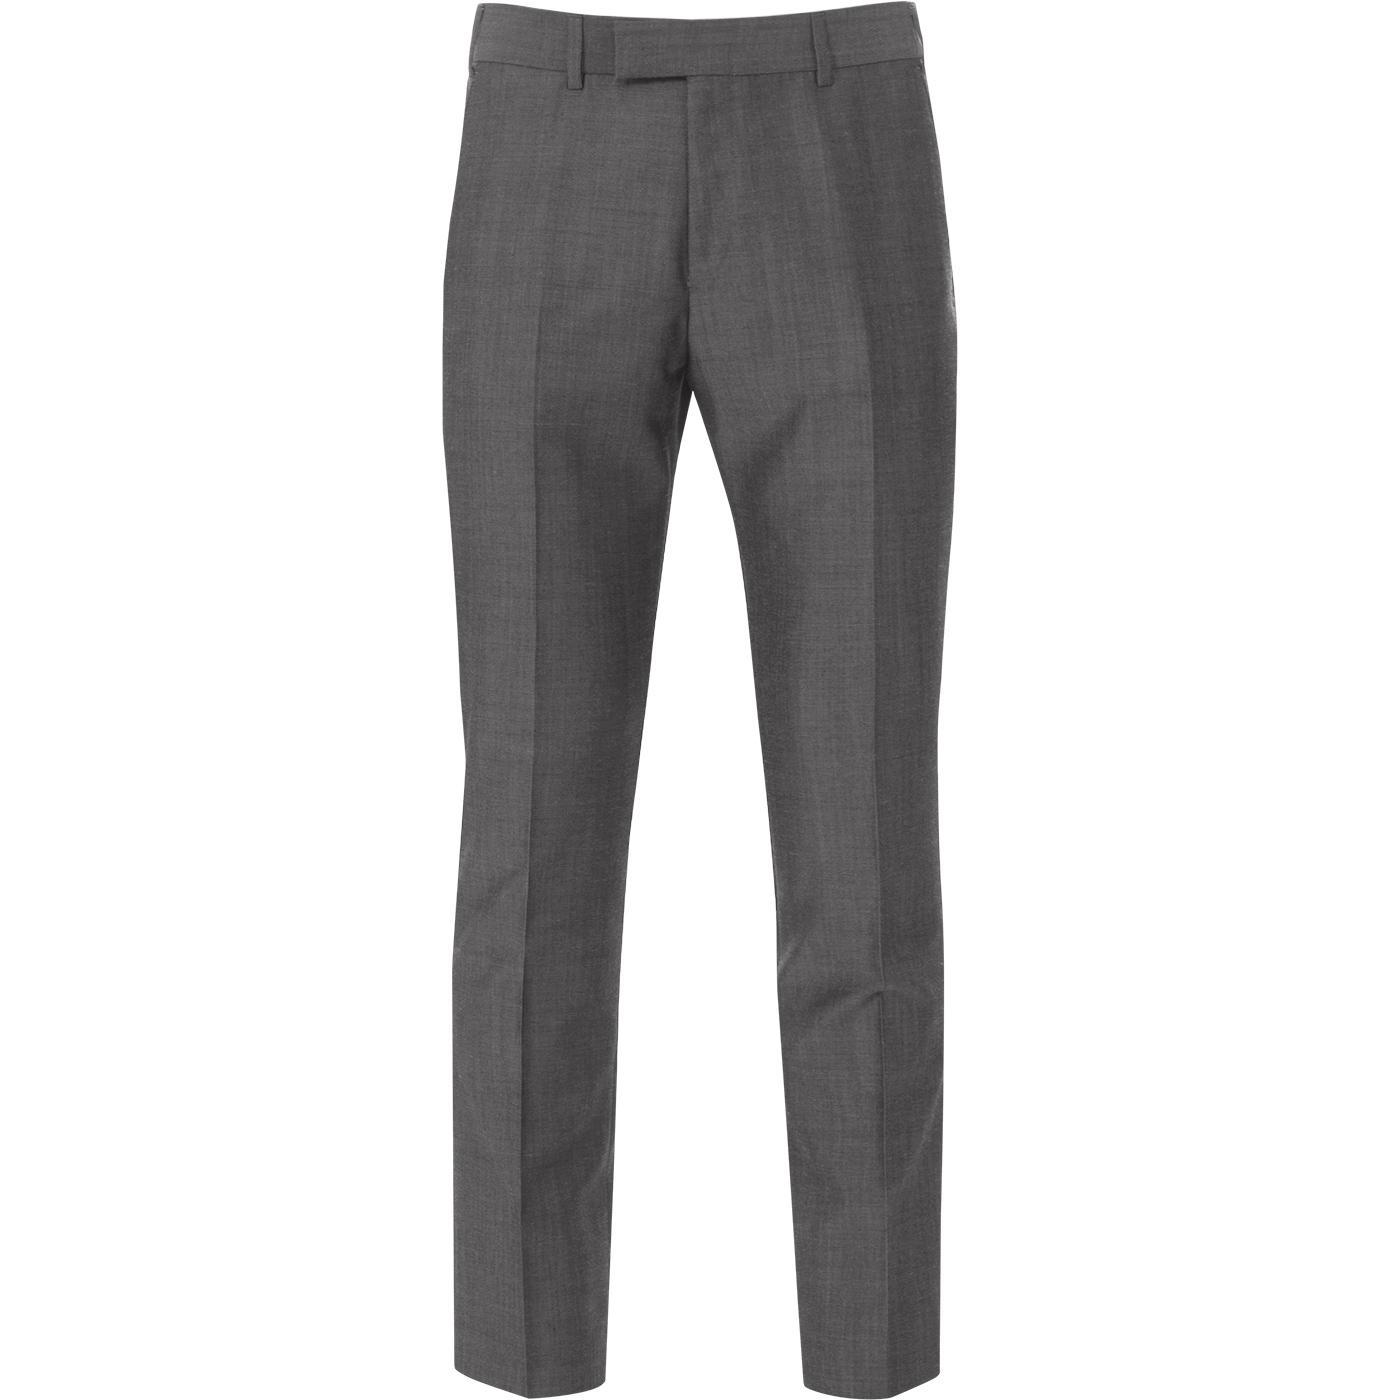 MADCAP ENGLAND Mohair Tonic Suit Trousers (Silver)